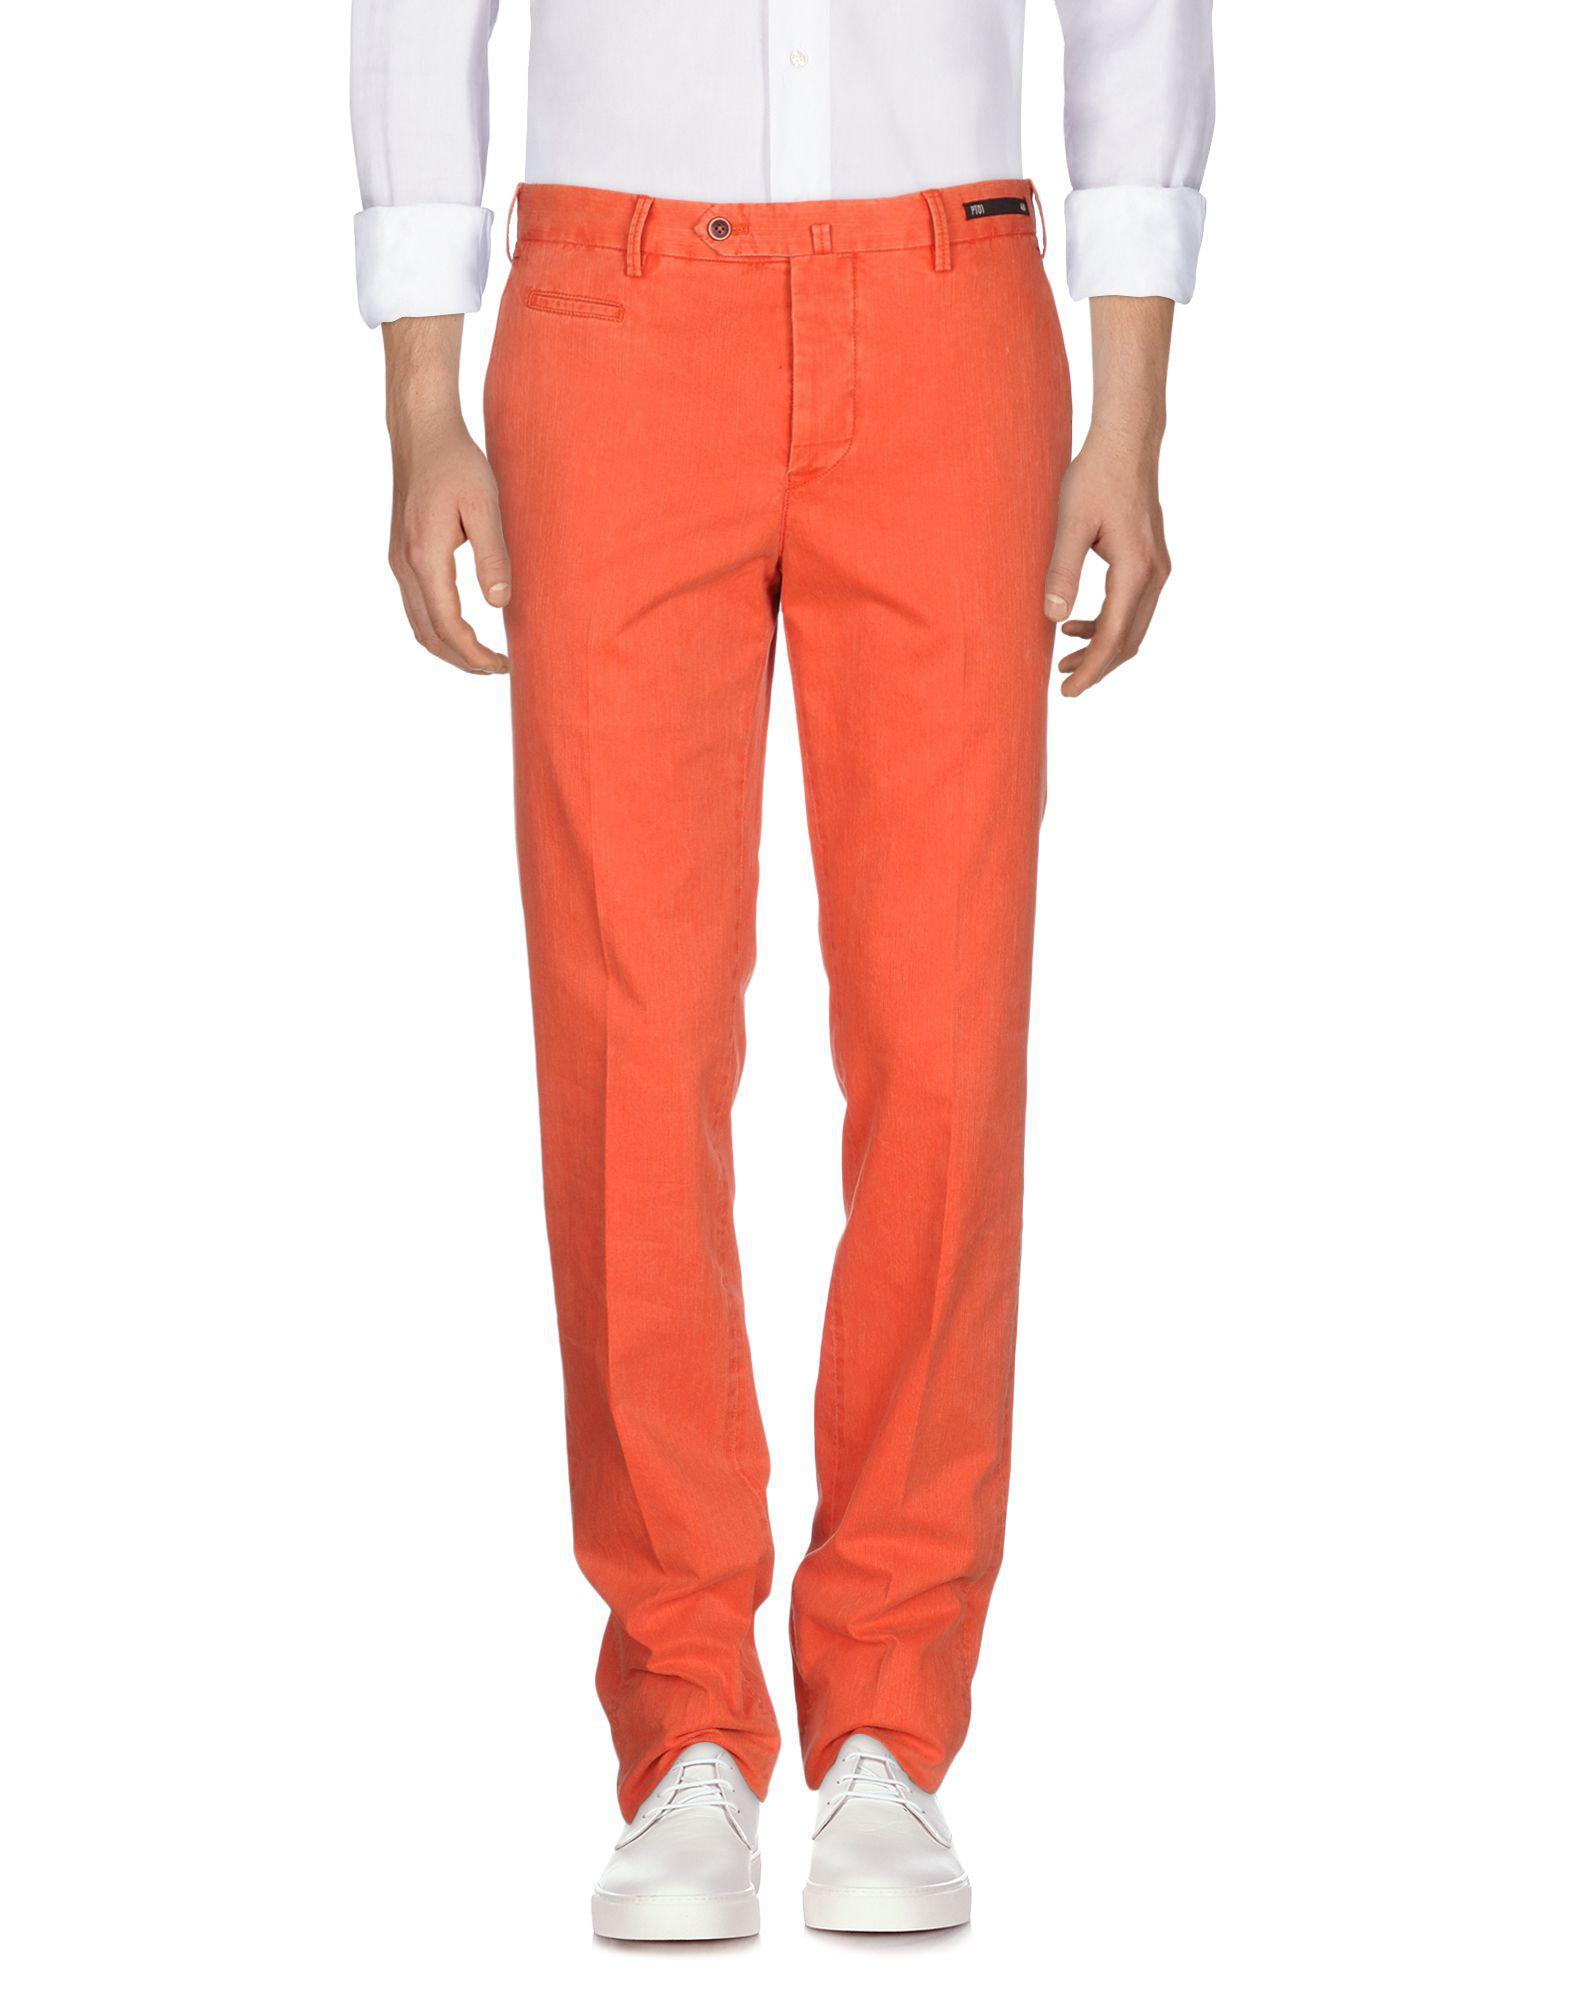 DENIM - Denim trousers PT01 7Rst8pk4